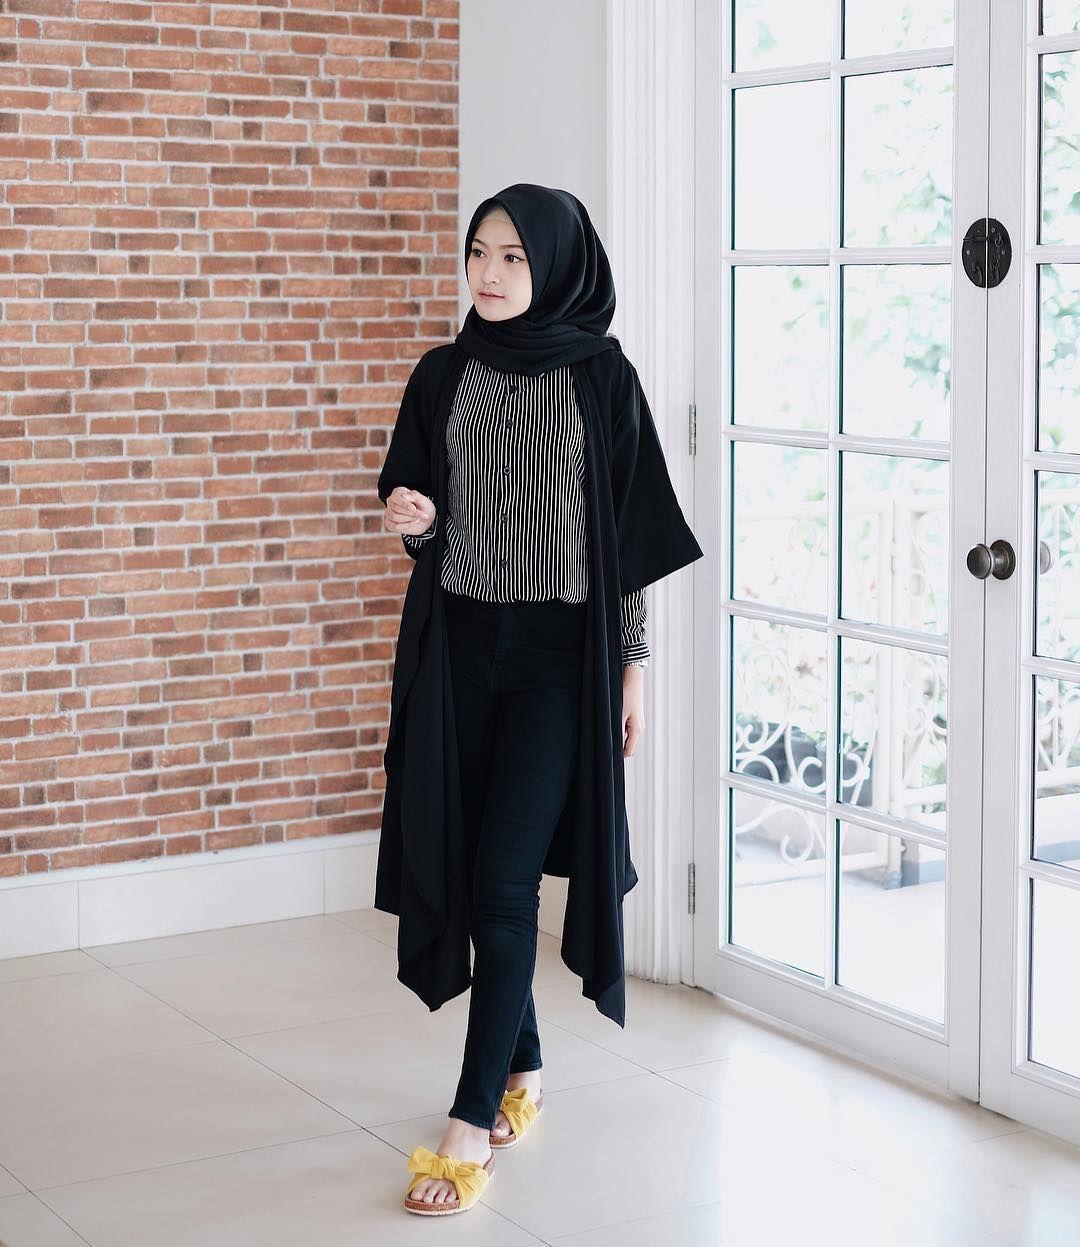 6 051 Likes 33 Comments Sari Endah Pratiwi Saritiw On Instagram Tunic From Hijup Use Code V Hijab Fashion Hijabi Outfits Casual Modern Hijab Fashion